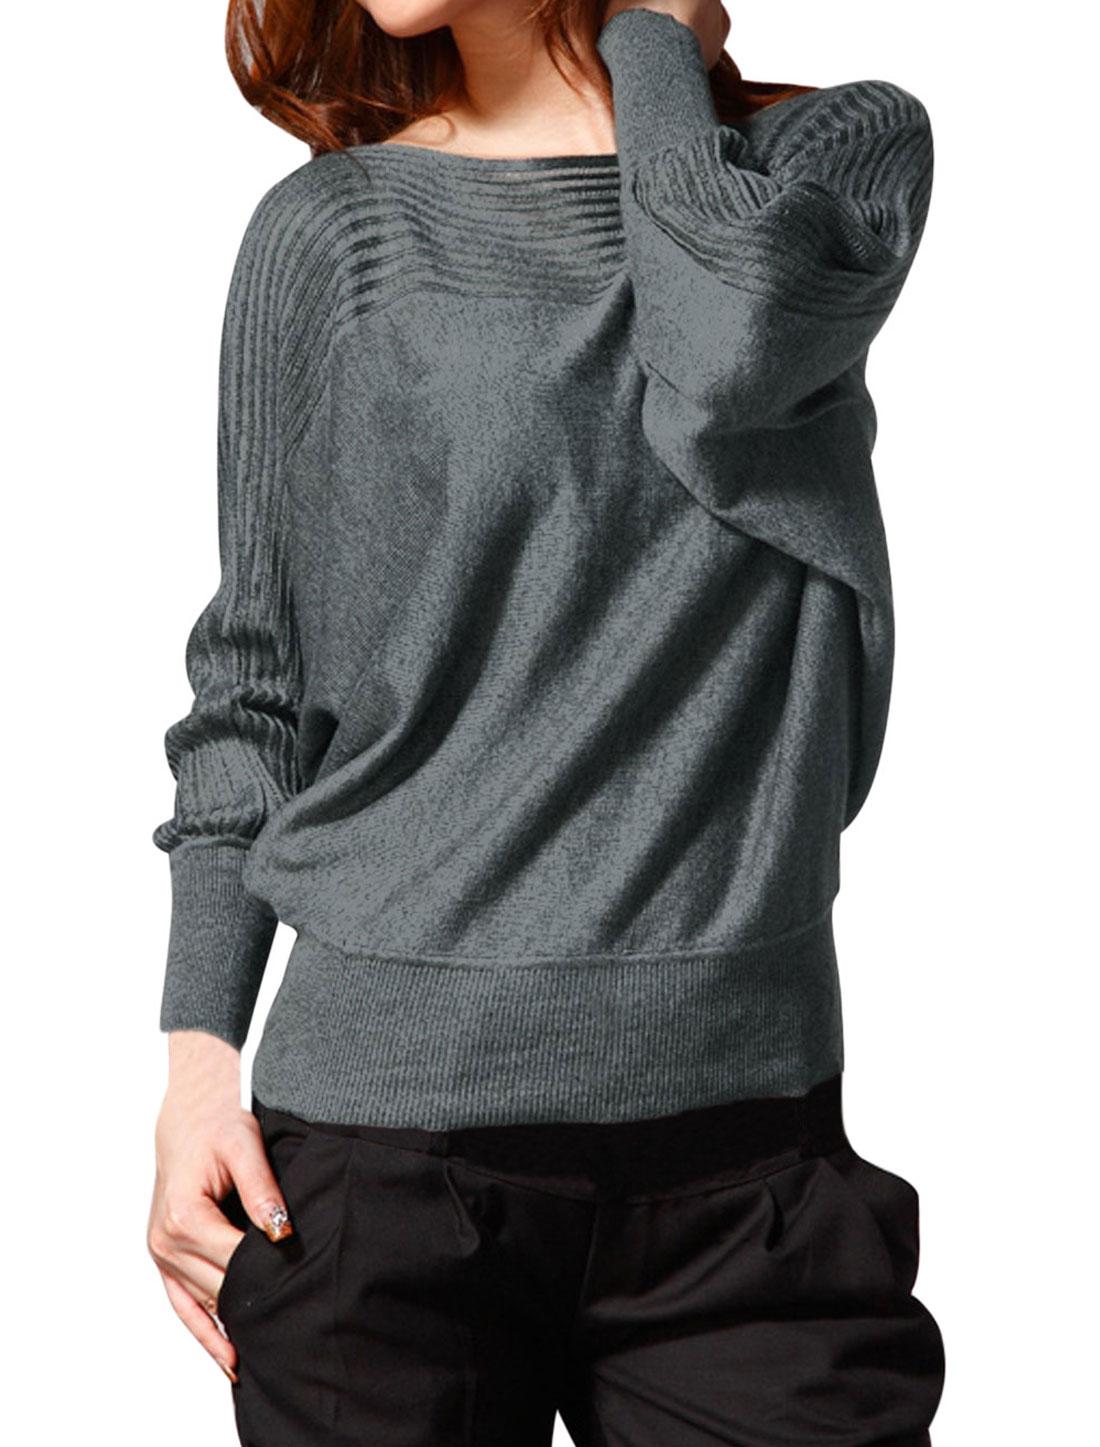 Women Semi Sheer Yoke Slipover Loose Fit Casual Knit Top Gray XS